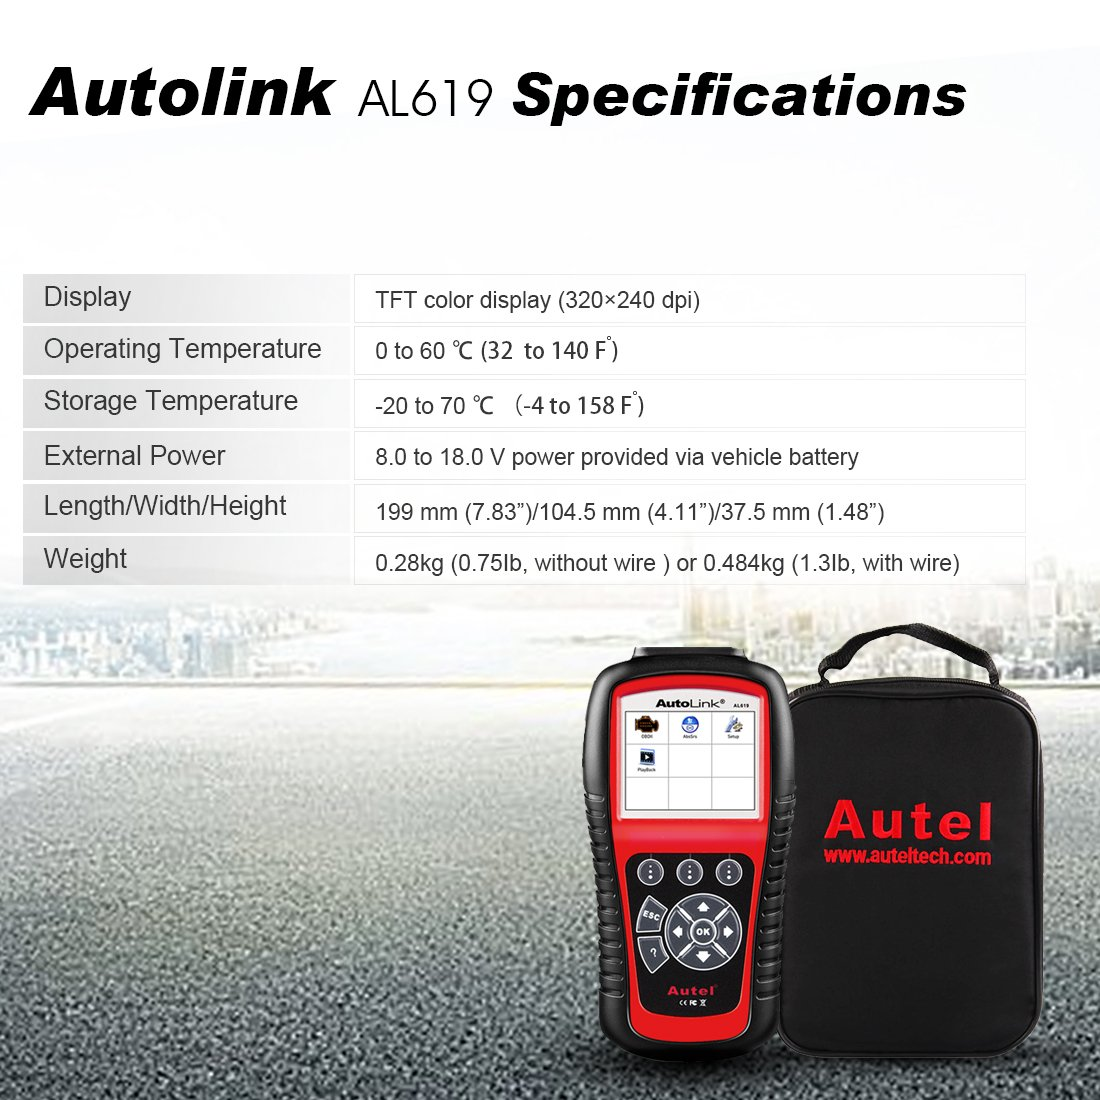 Autel AL301 die ABS/SRS + Kann OBDII Diagnosegerät AutoLink, AL619 ...